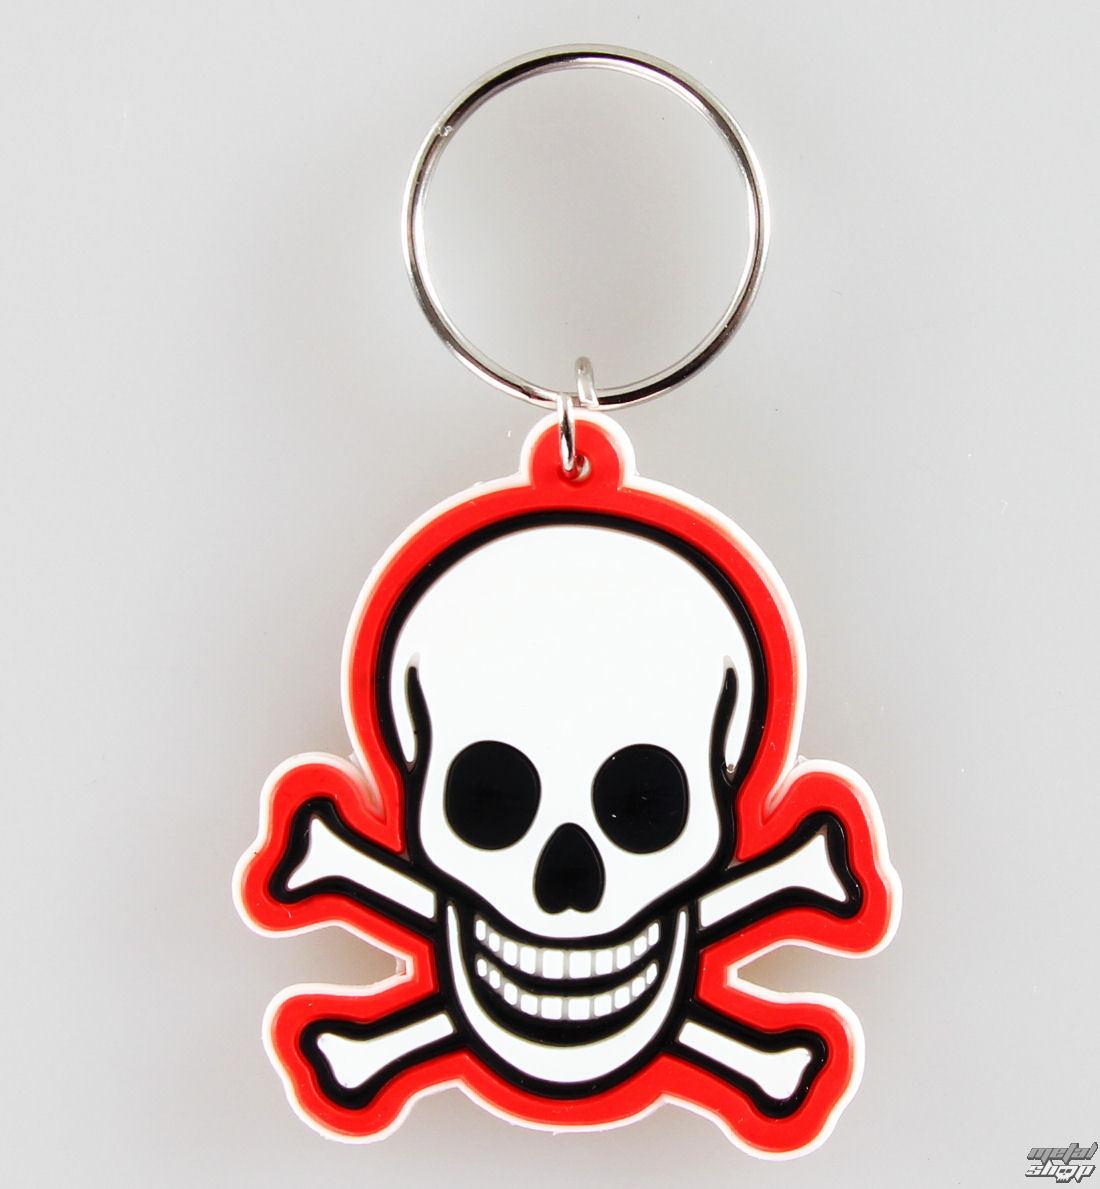 kľúčenka (prívesok) Skull - N Bones Toxi - PYRAMID POSTERS - RK38038